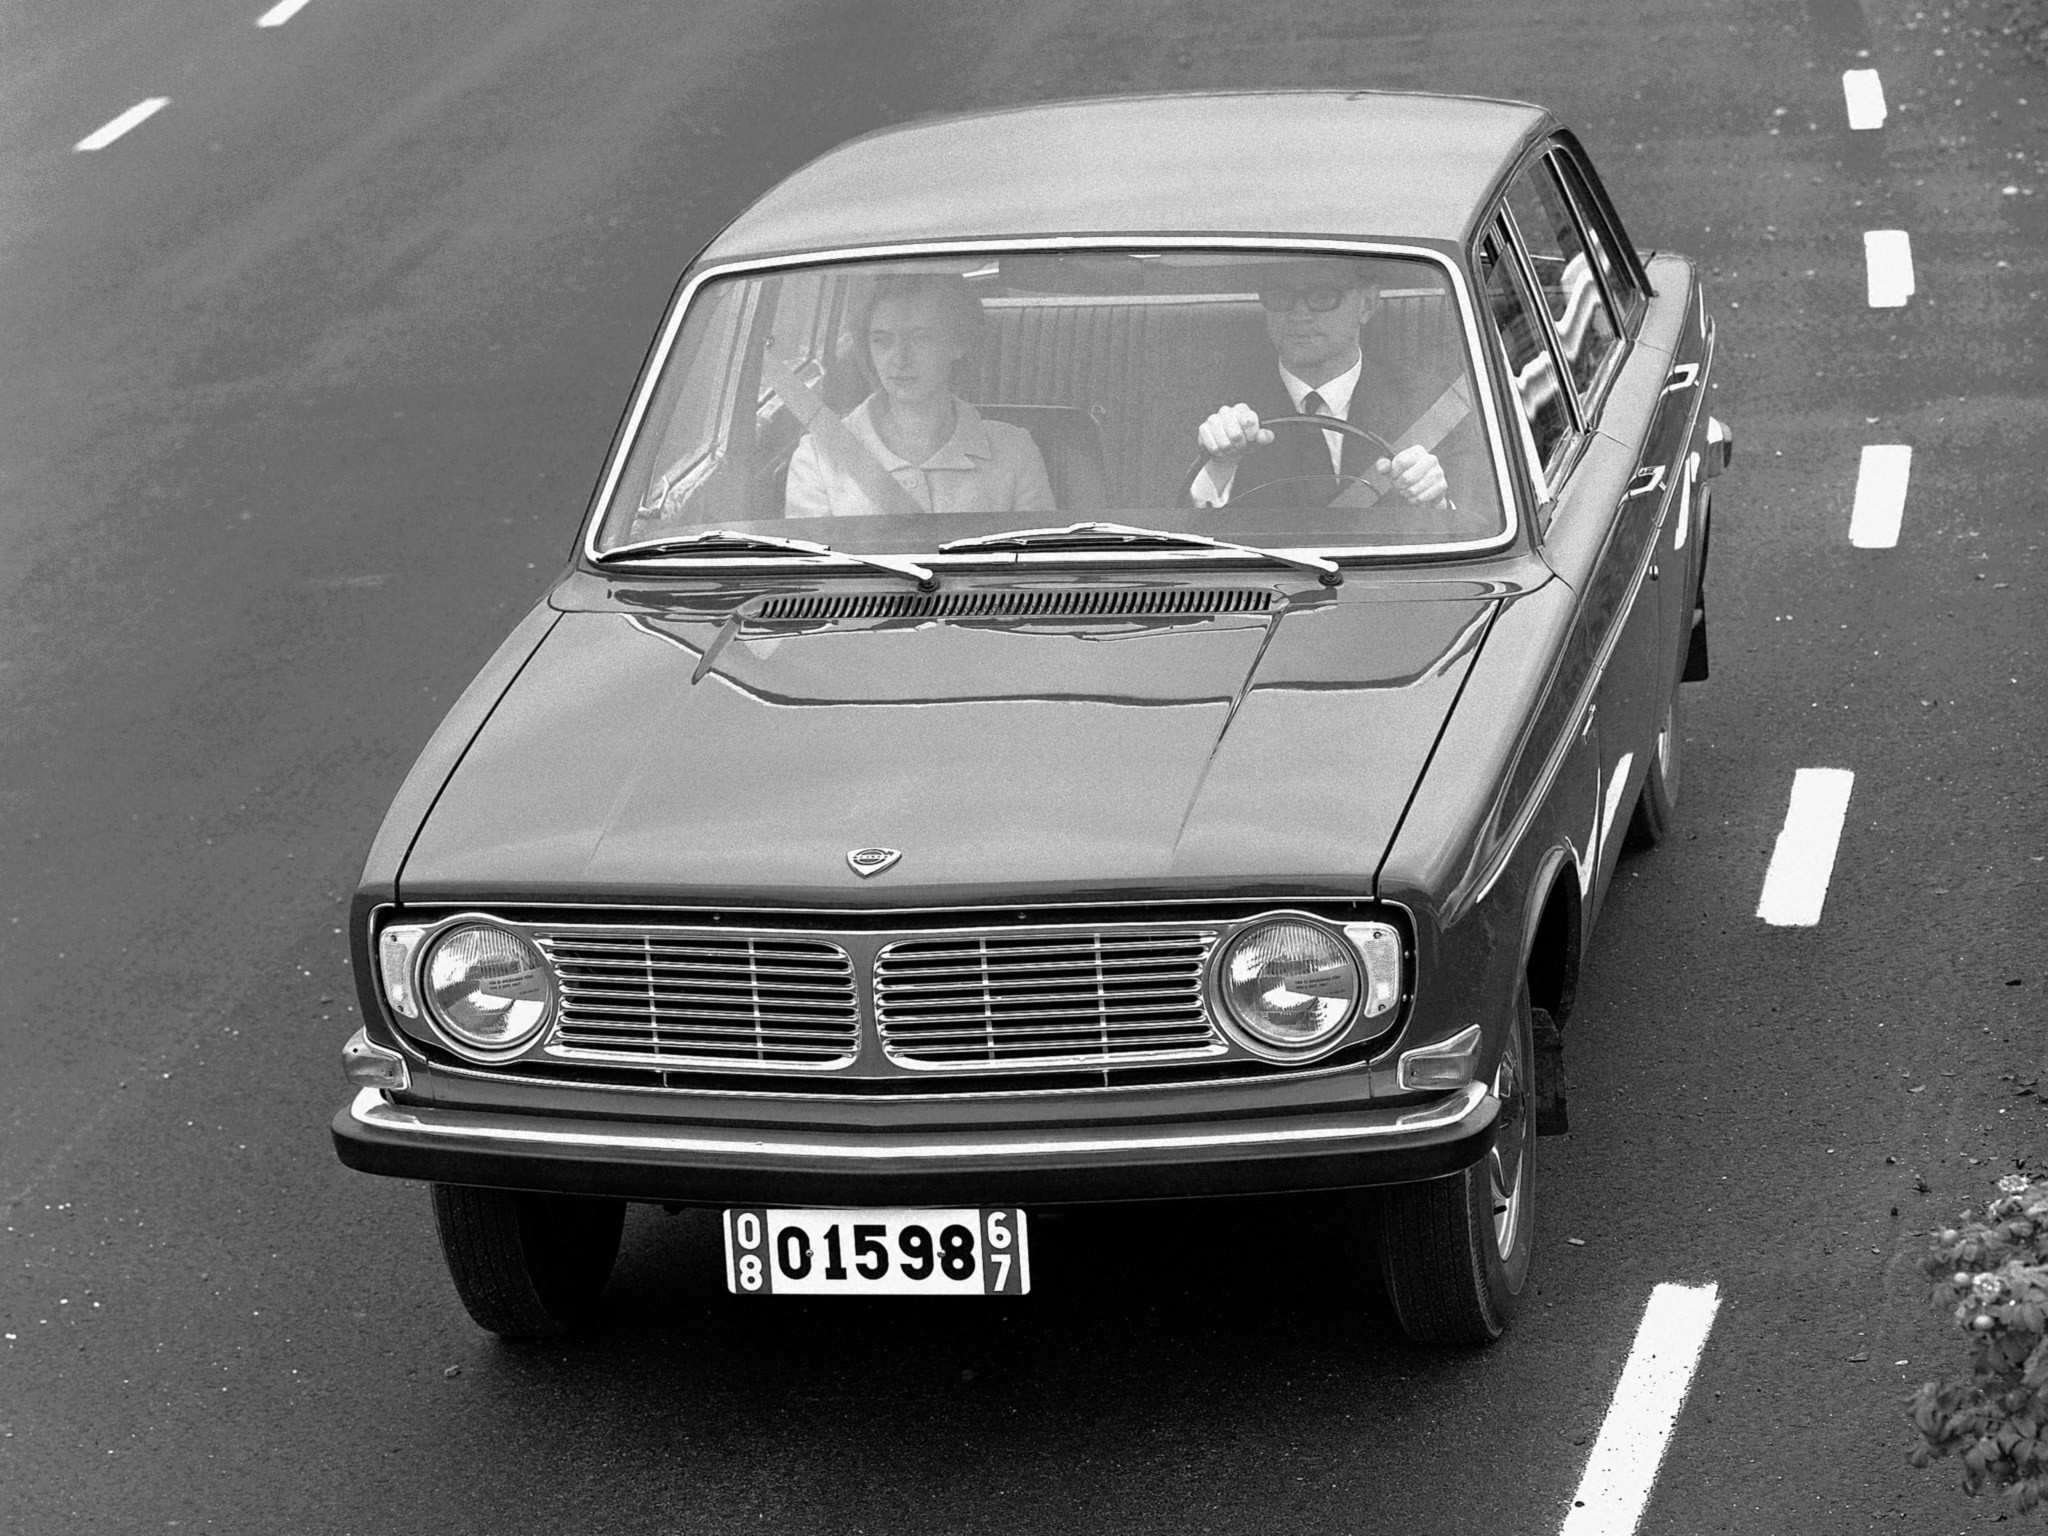 VOLVO 144 - 1967, 1968, 1969, 1970, 1971, 1972, 1973, 1974 ...